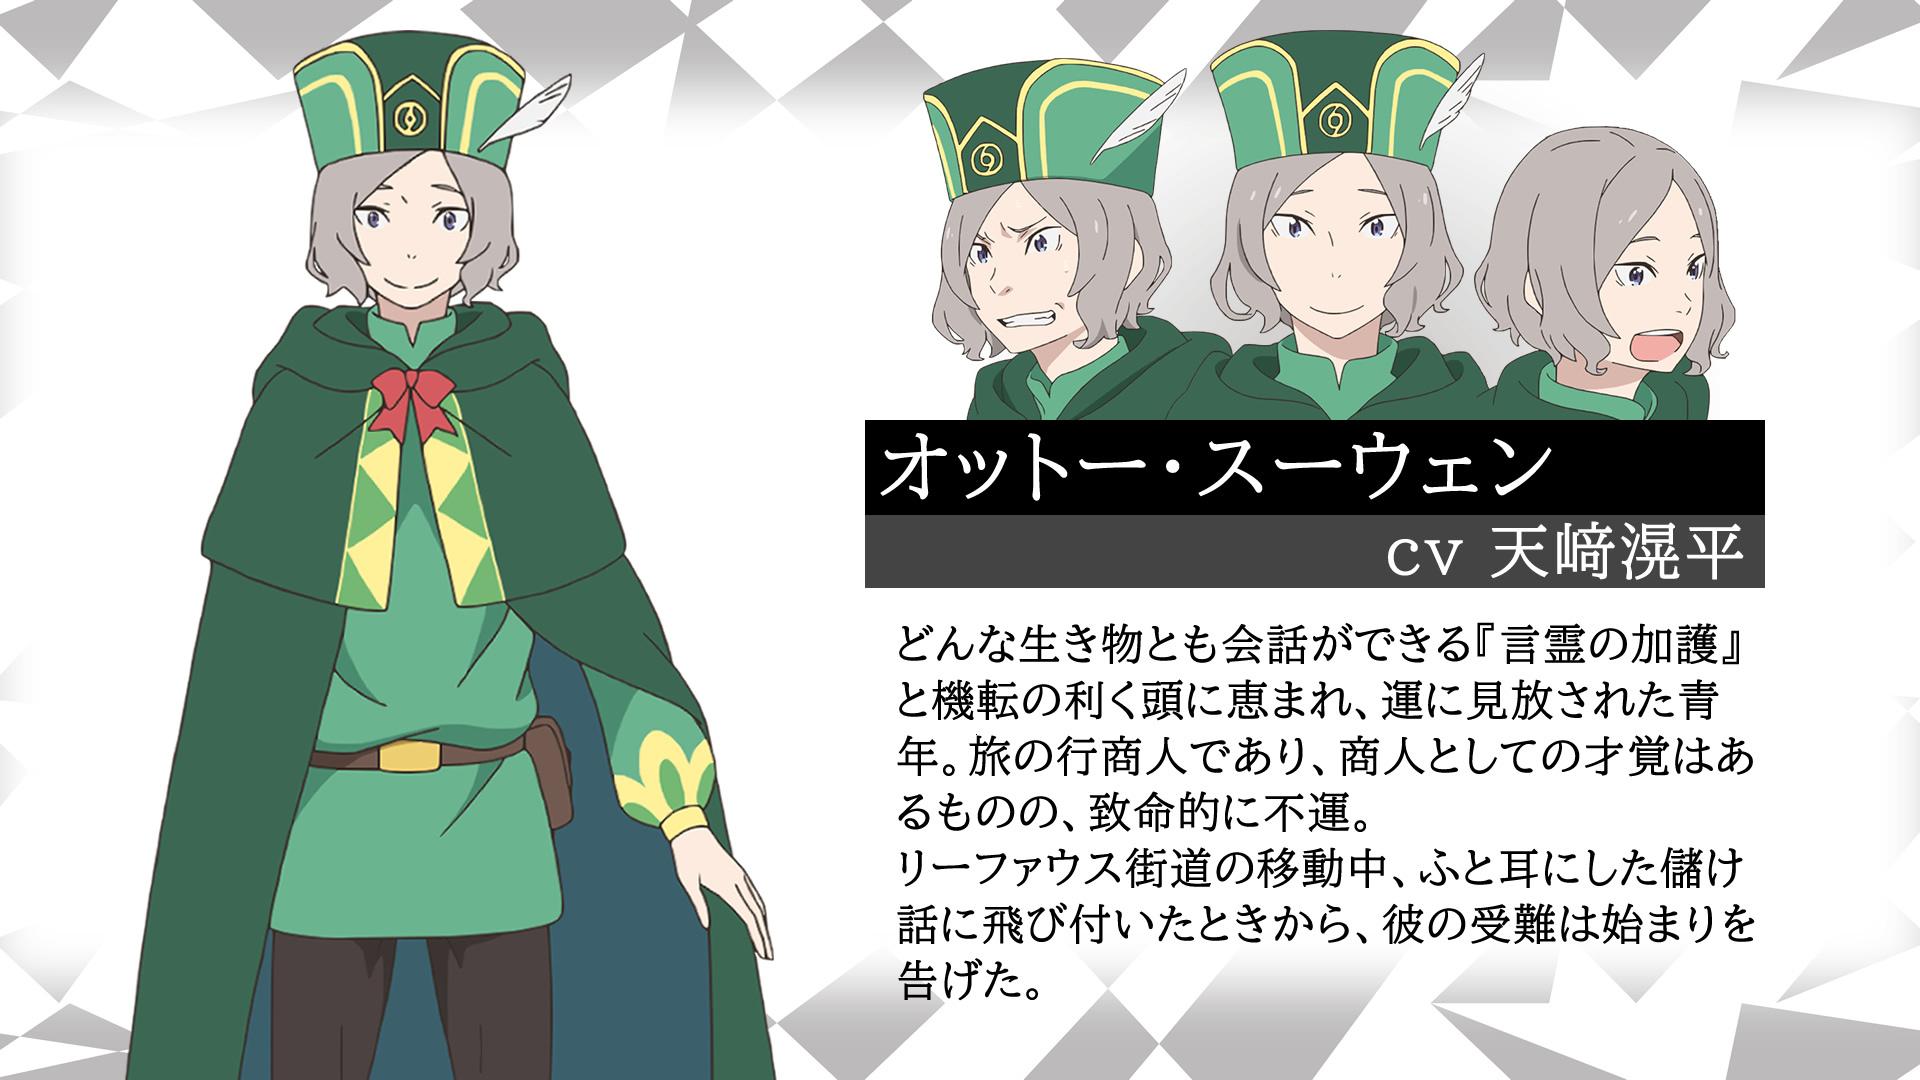 RE从零开始的异世界生活 第二季Rezero_official 1271060285449629697_p0